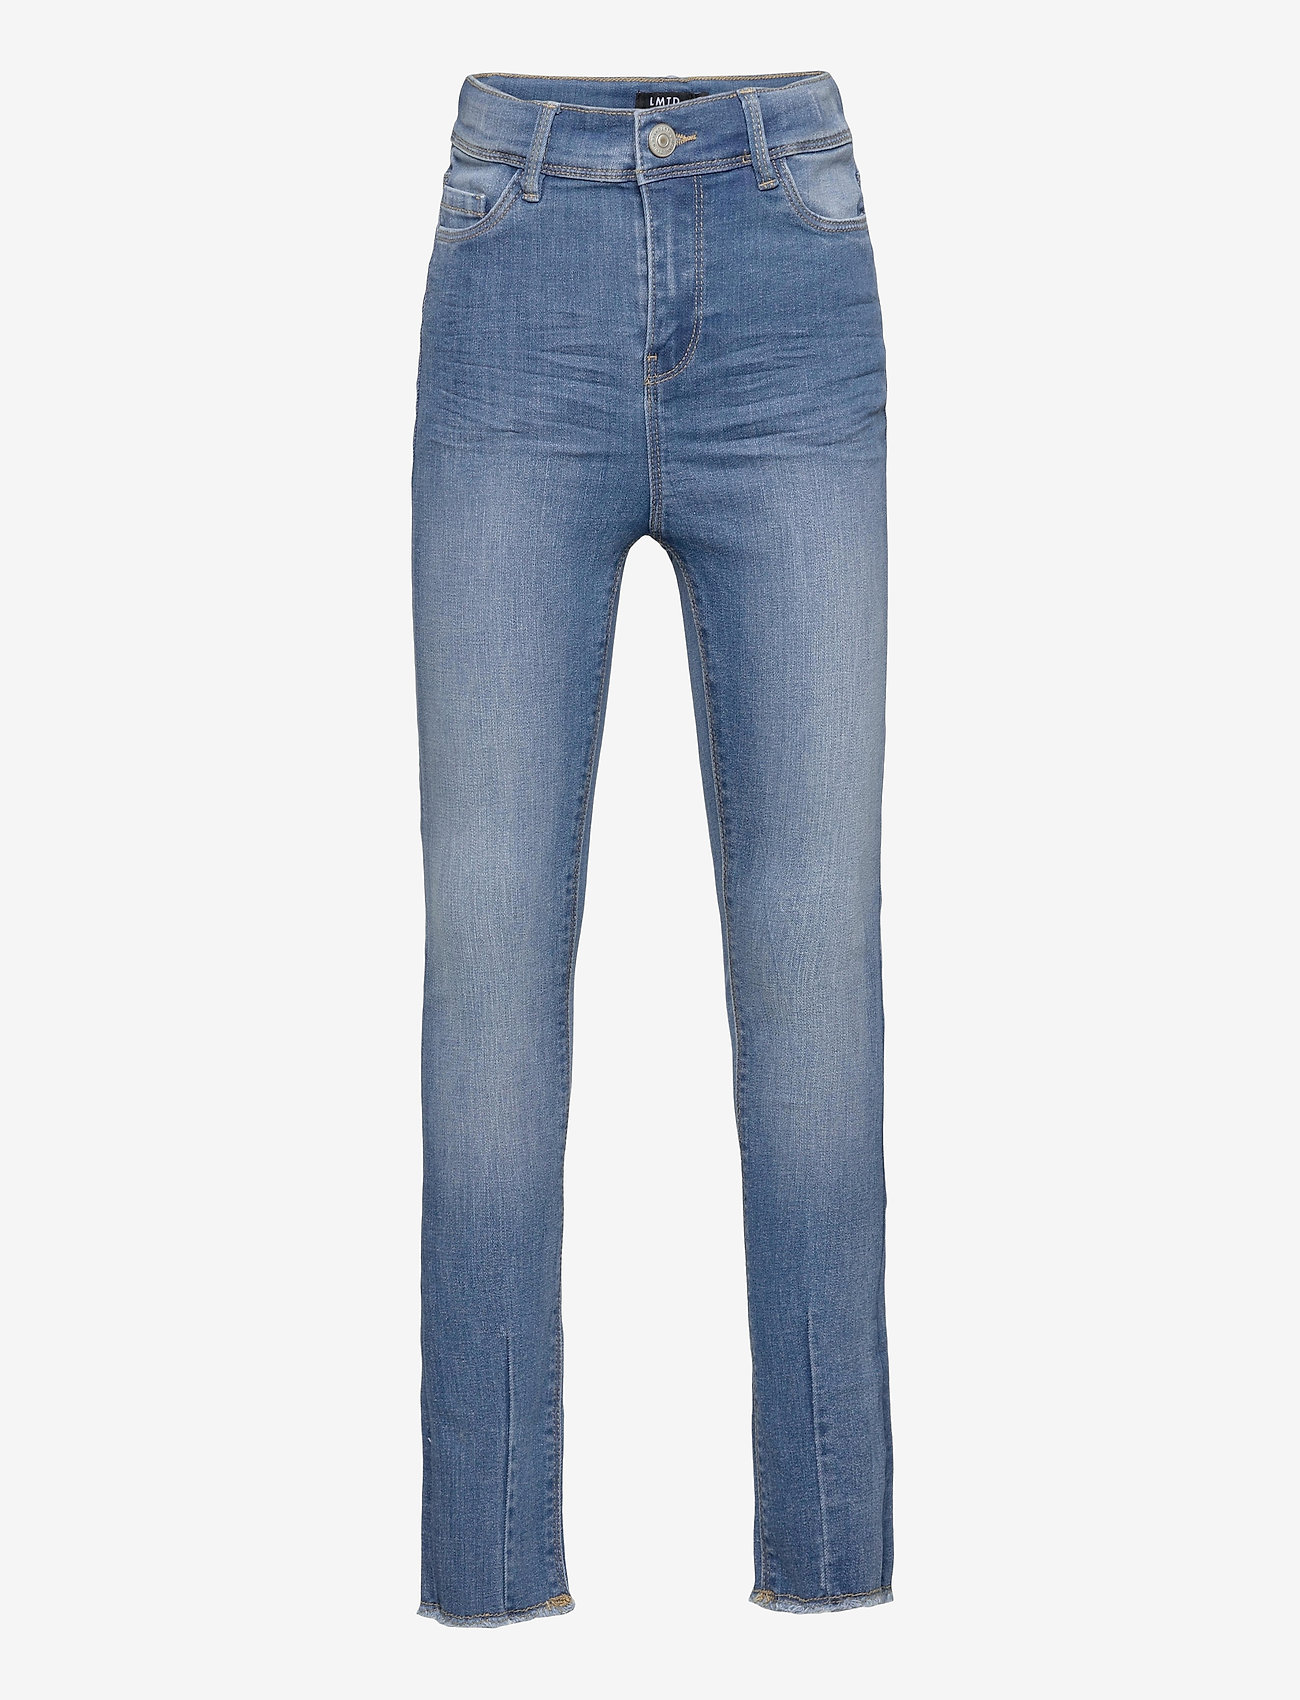 LMTD - NLFPIL DNMBATEJAS 2455 HW ANCLE PANT - jeans - medium blue denim - 0